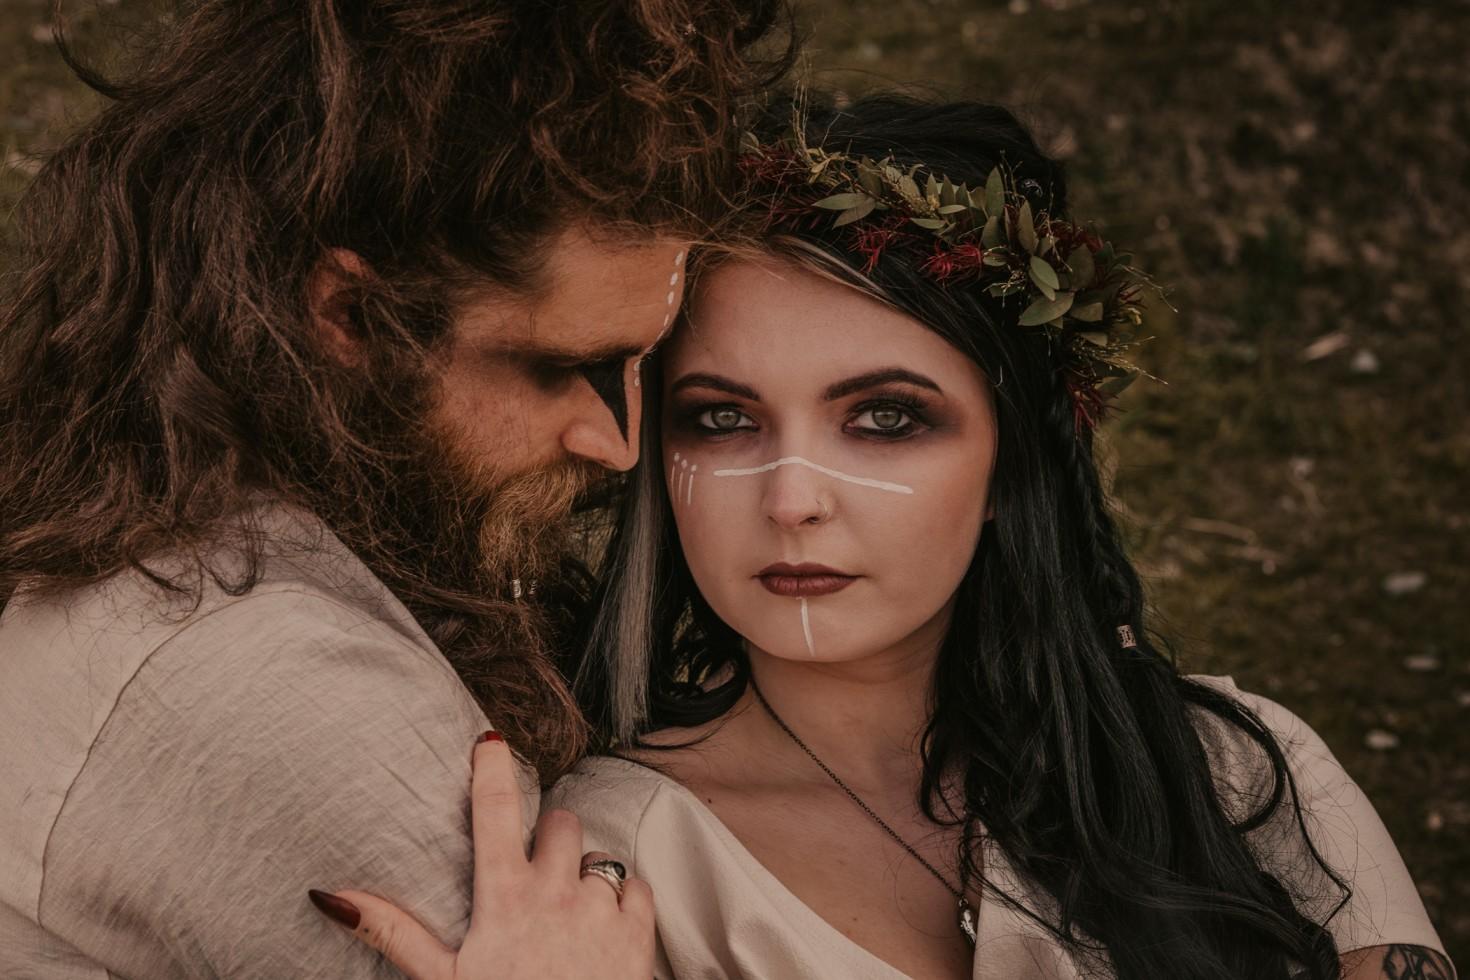 viking wedding - wild wedding - alternative wedding - unique wedding makeup - tribal bridal look